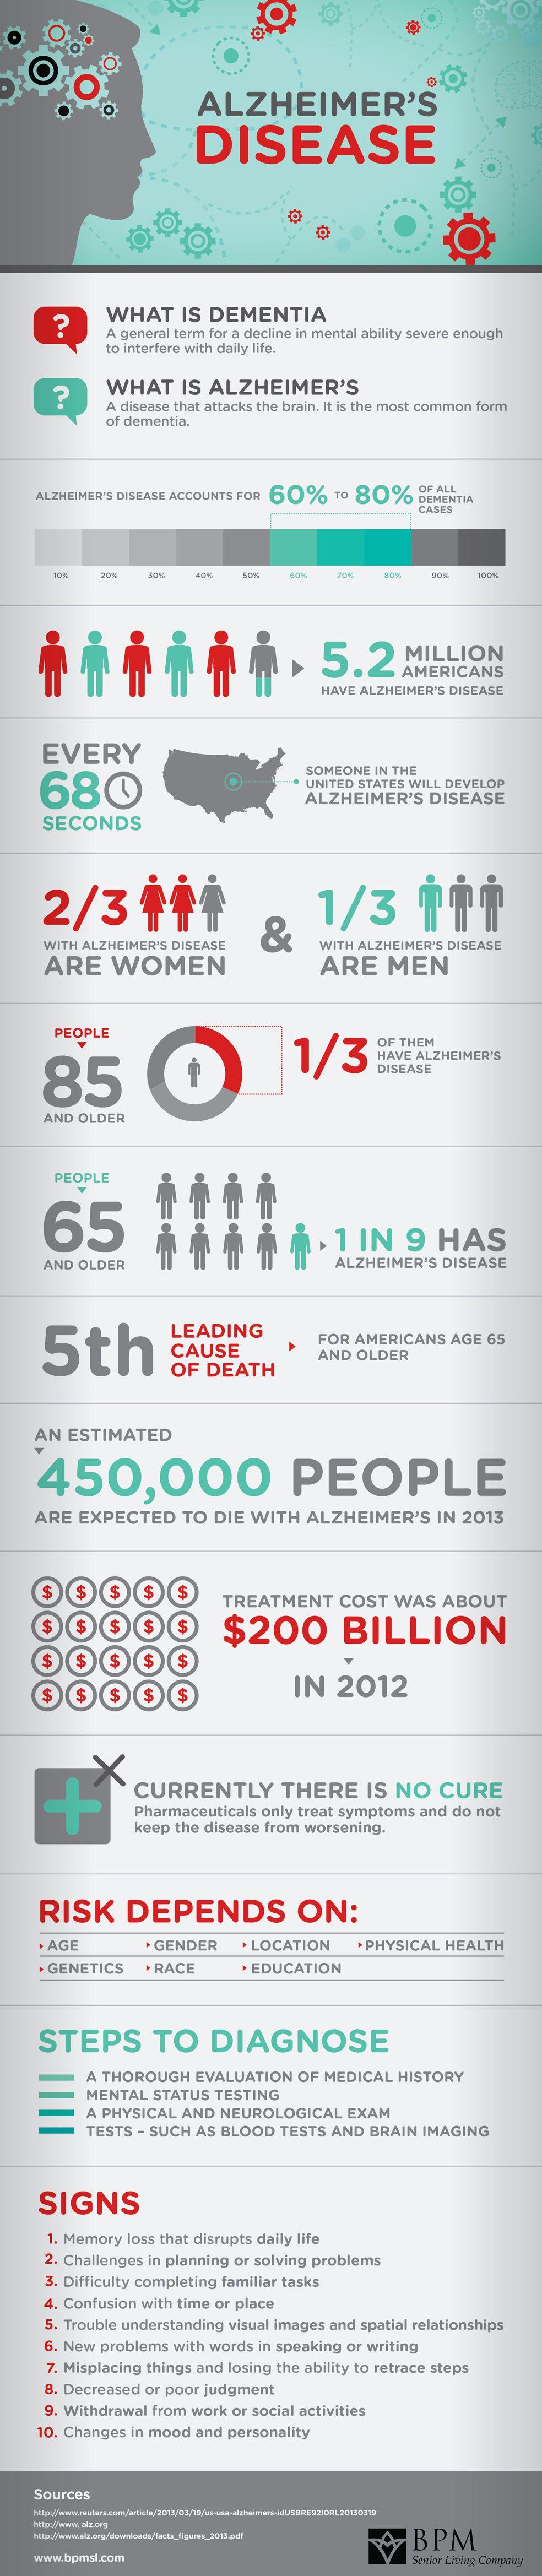 Keep yourself informed. https://twitter.com/LivingOnNutri    #Alzheimers and #Dementia #Infographic